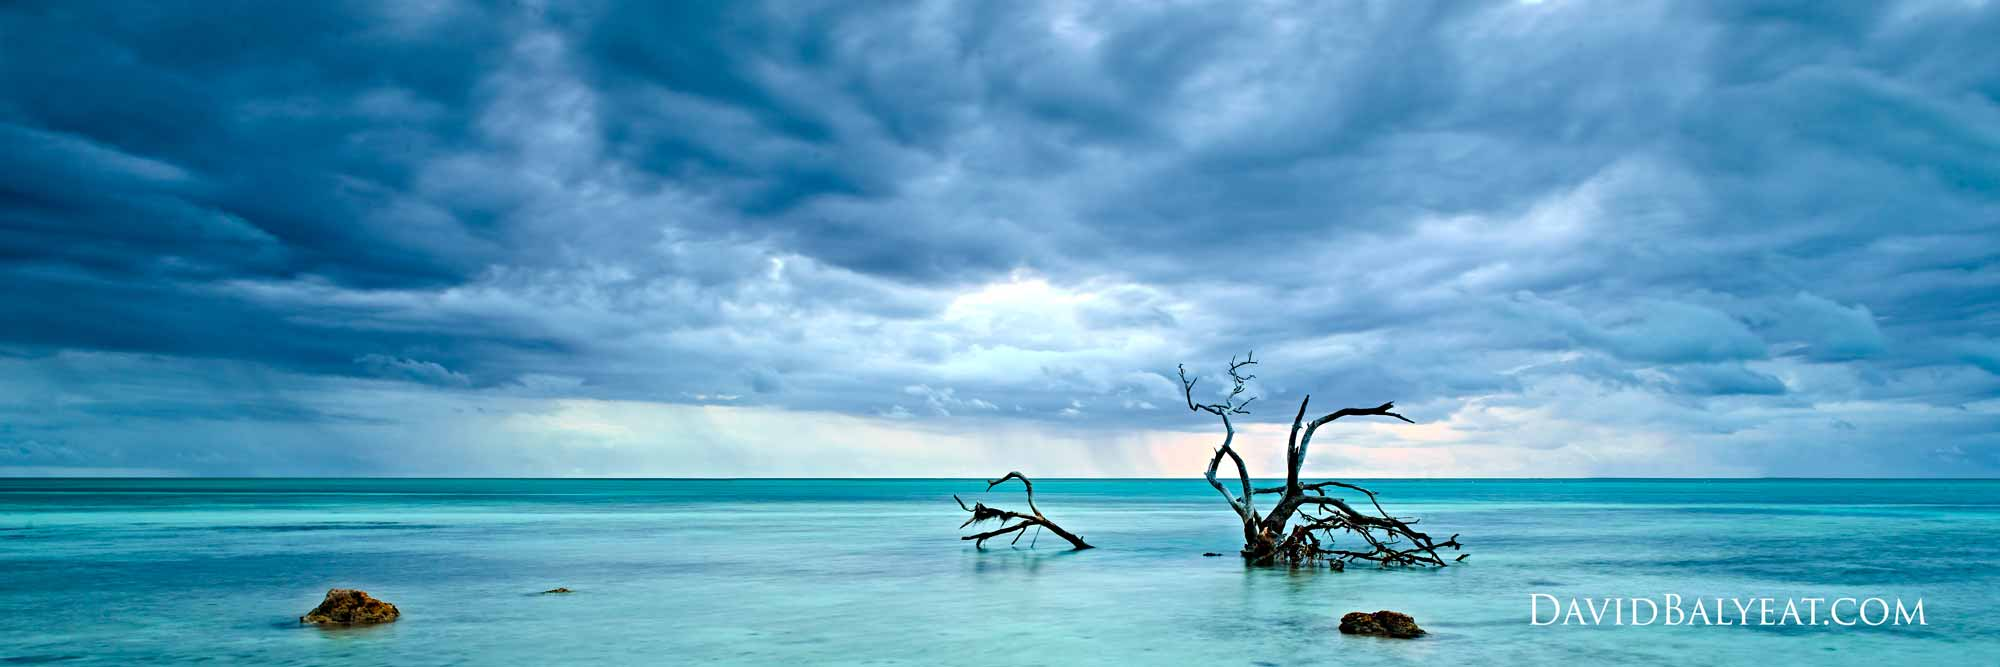 Florida Keys stormy sunrise panoramic high definition HD professional landscape photography